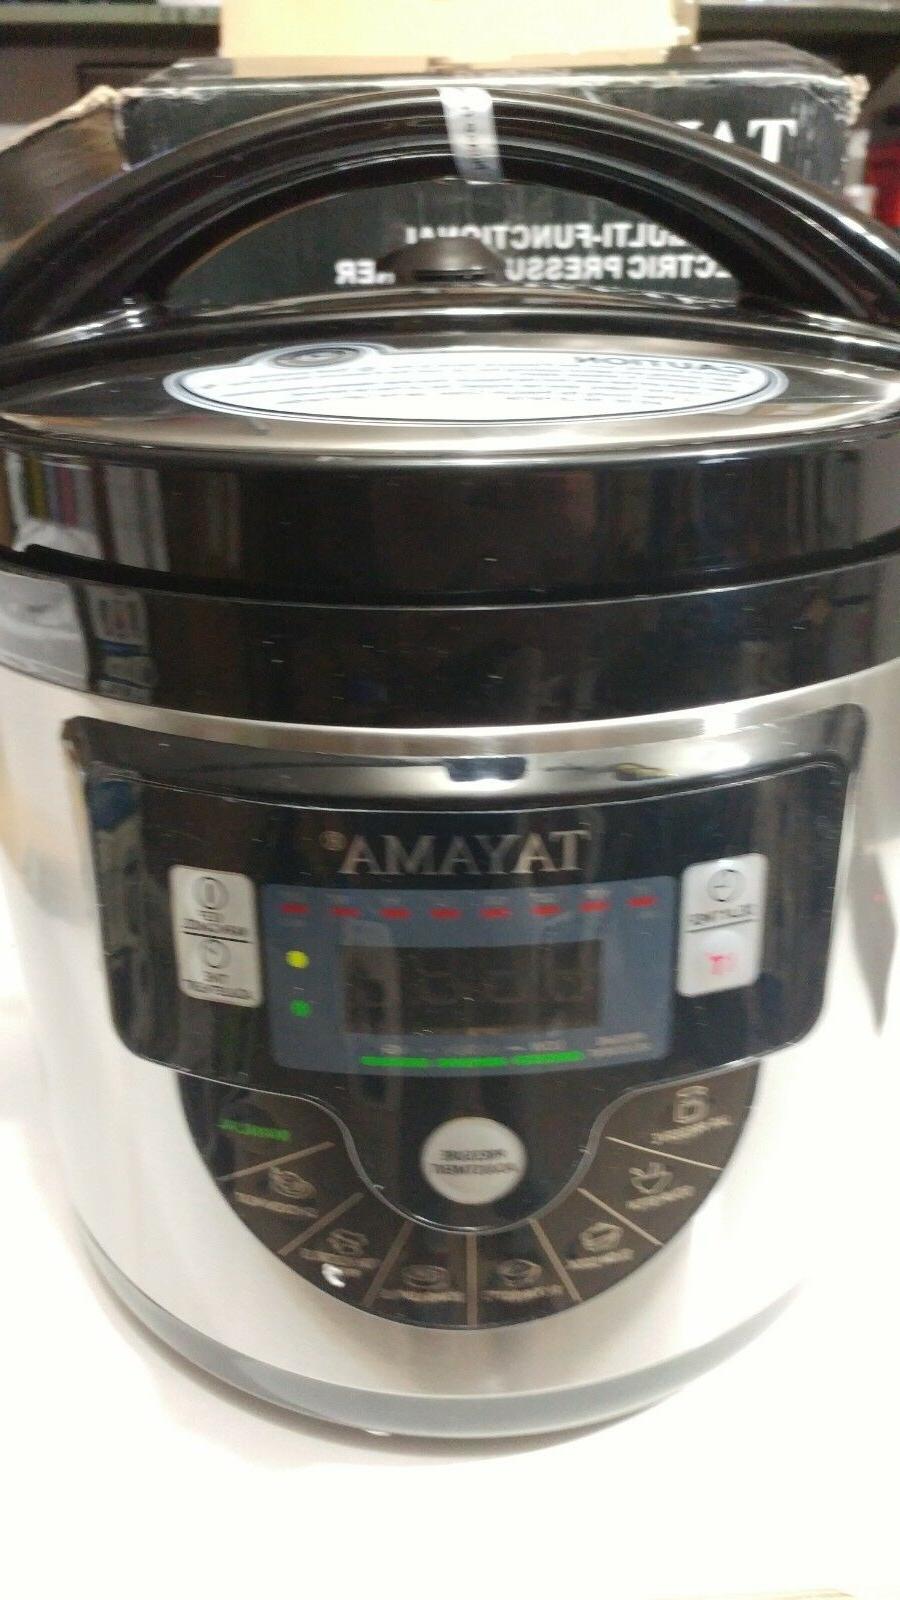 Tayama TMC-60XL 6 8 in Function Pressure Qt, -